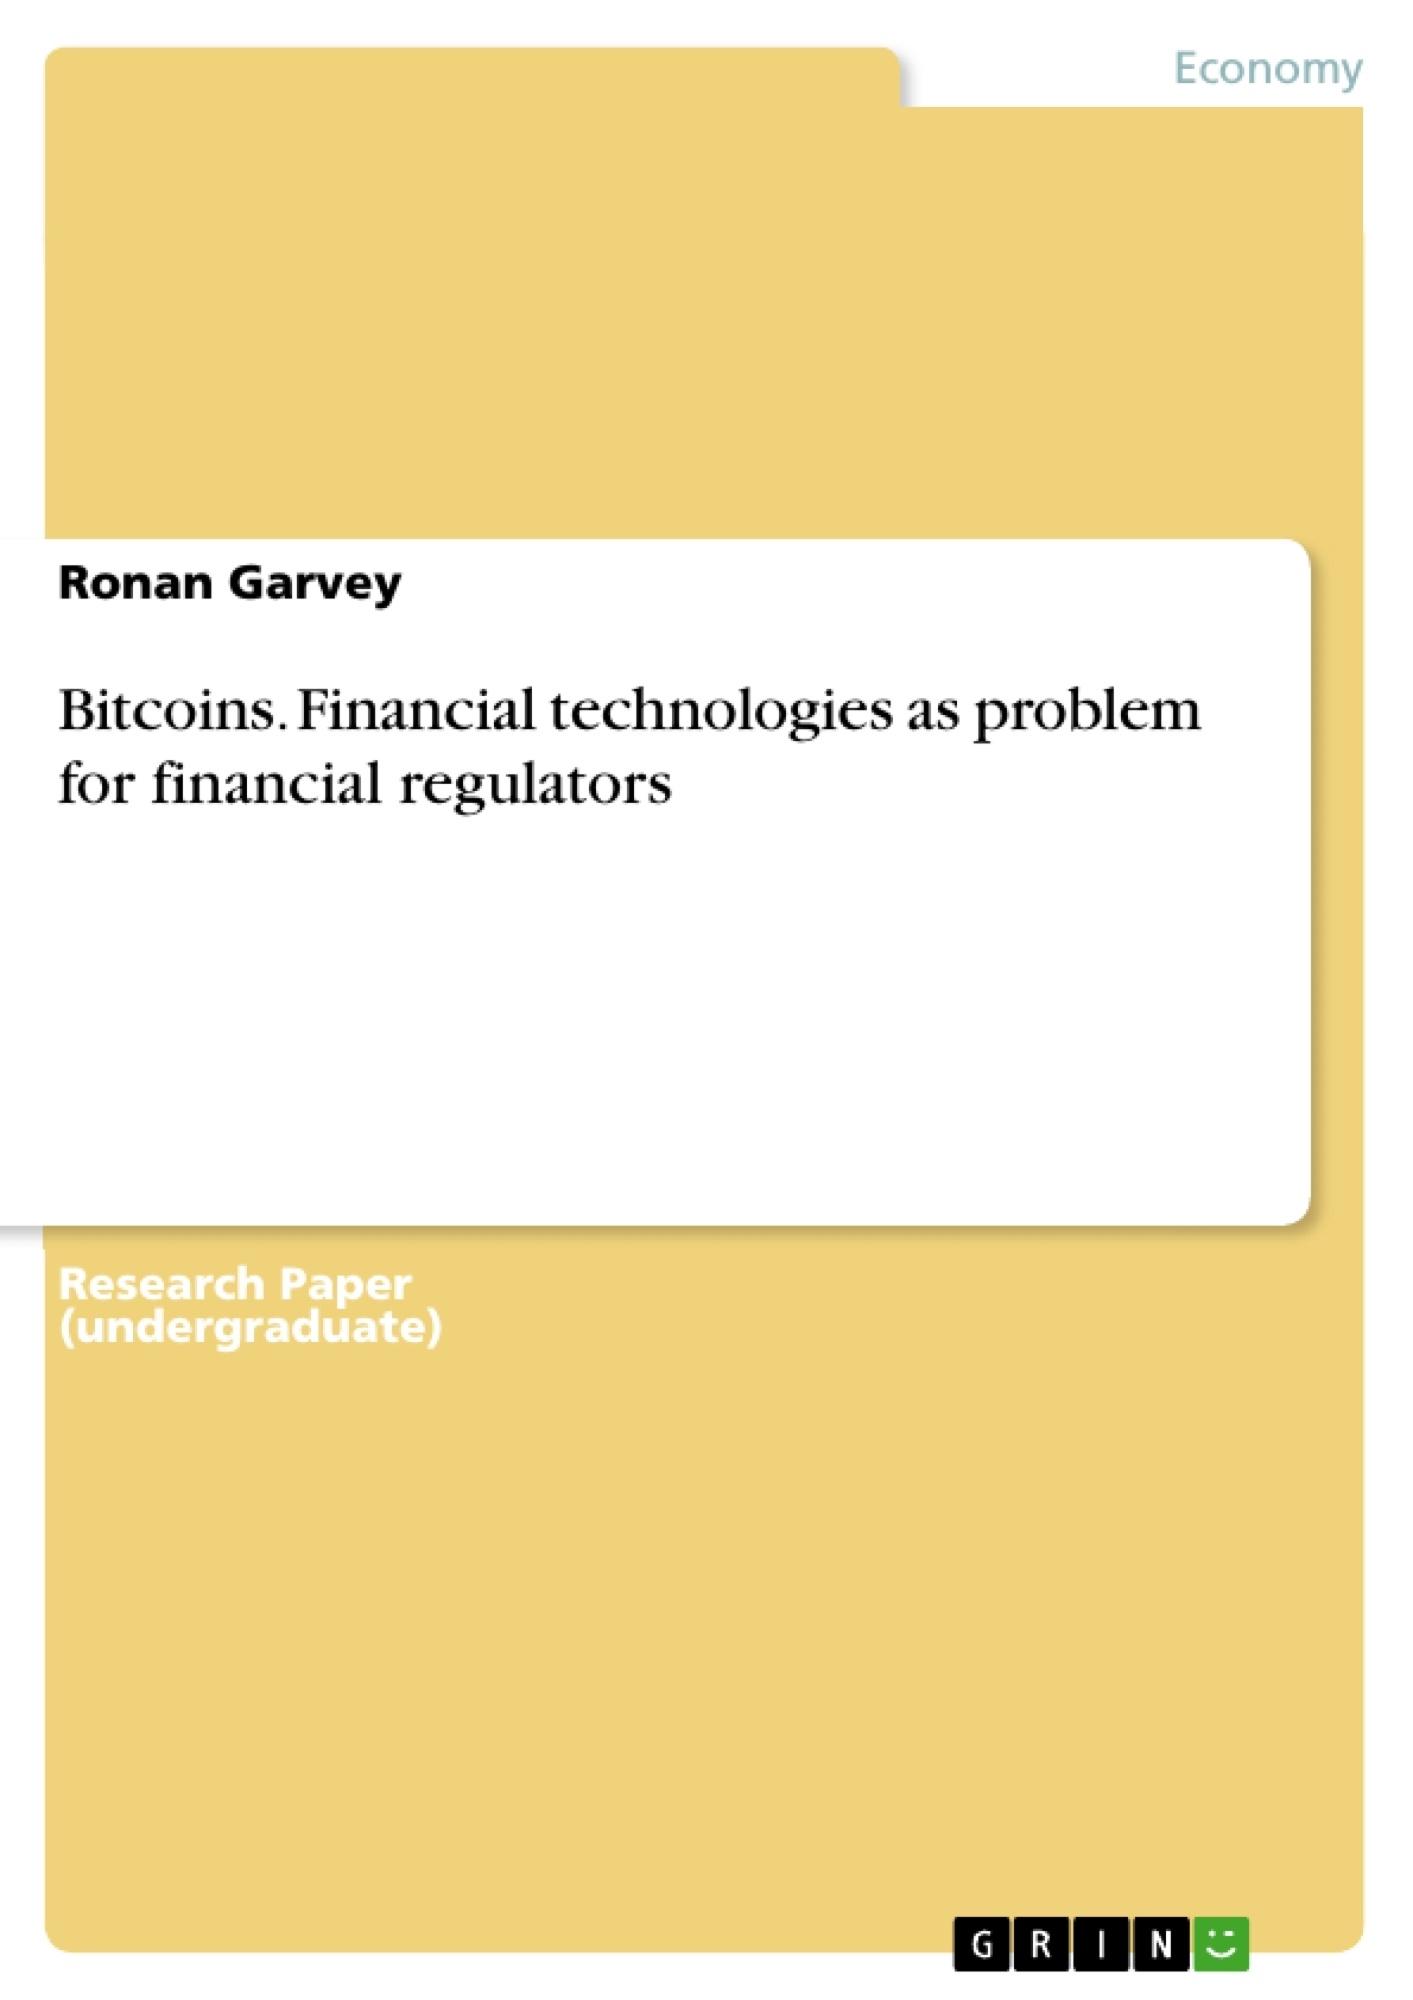 Title: Bitcoins. Financial technologies as problem for financial regulators